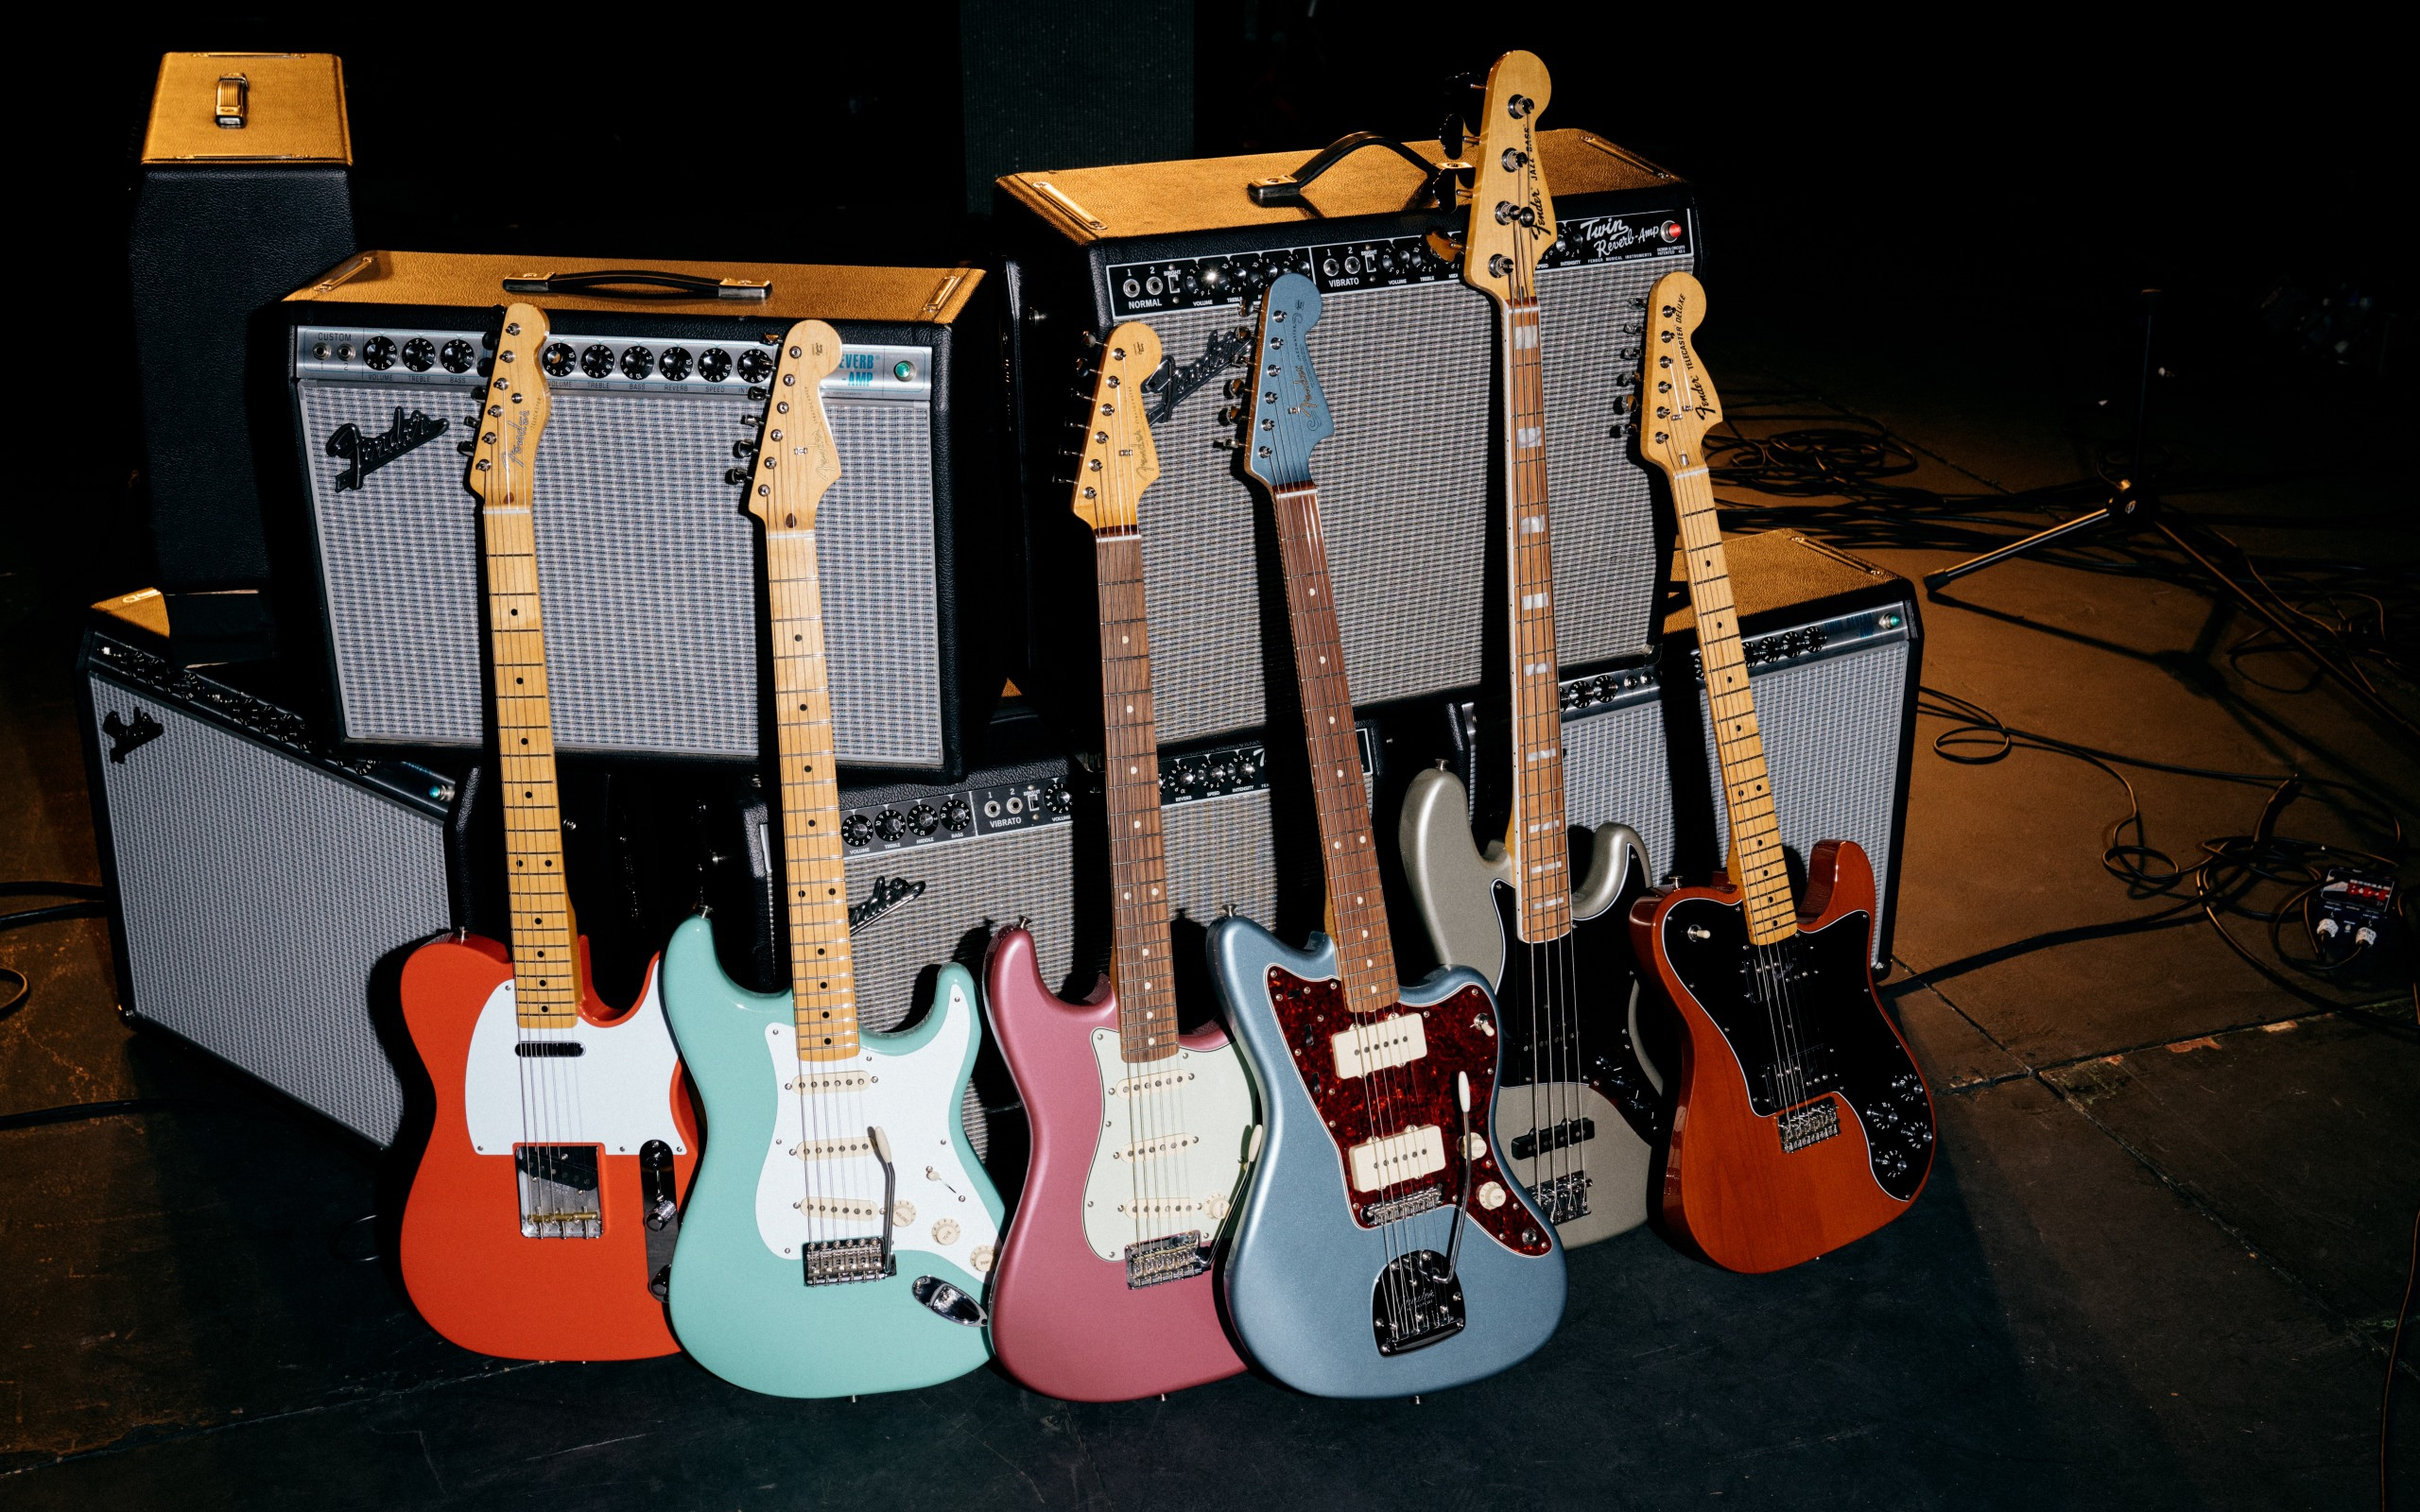 Fender ofrece clases de guitarra gratuitas durante tres meses